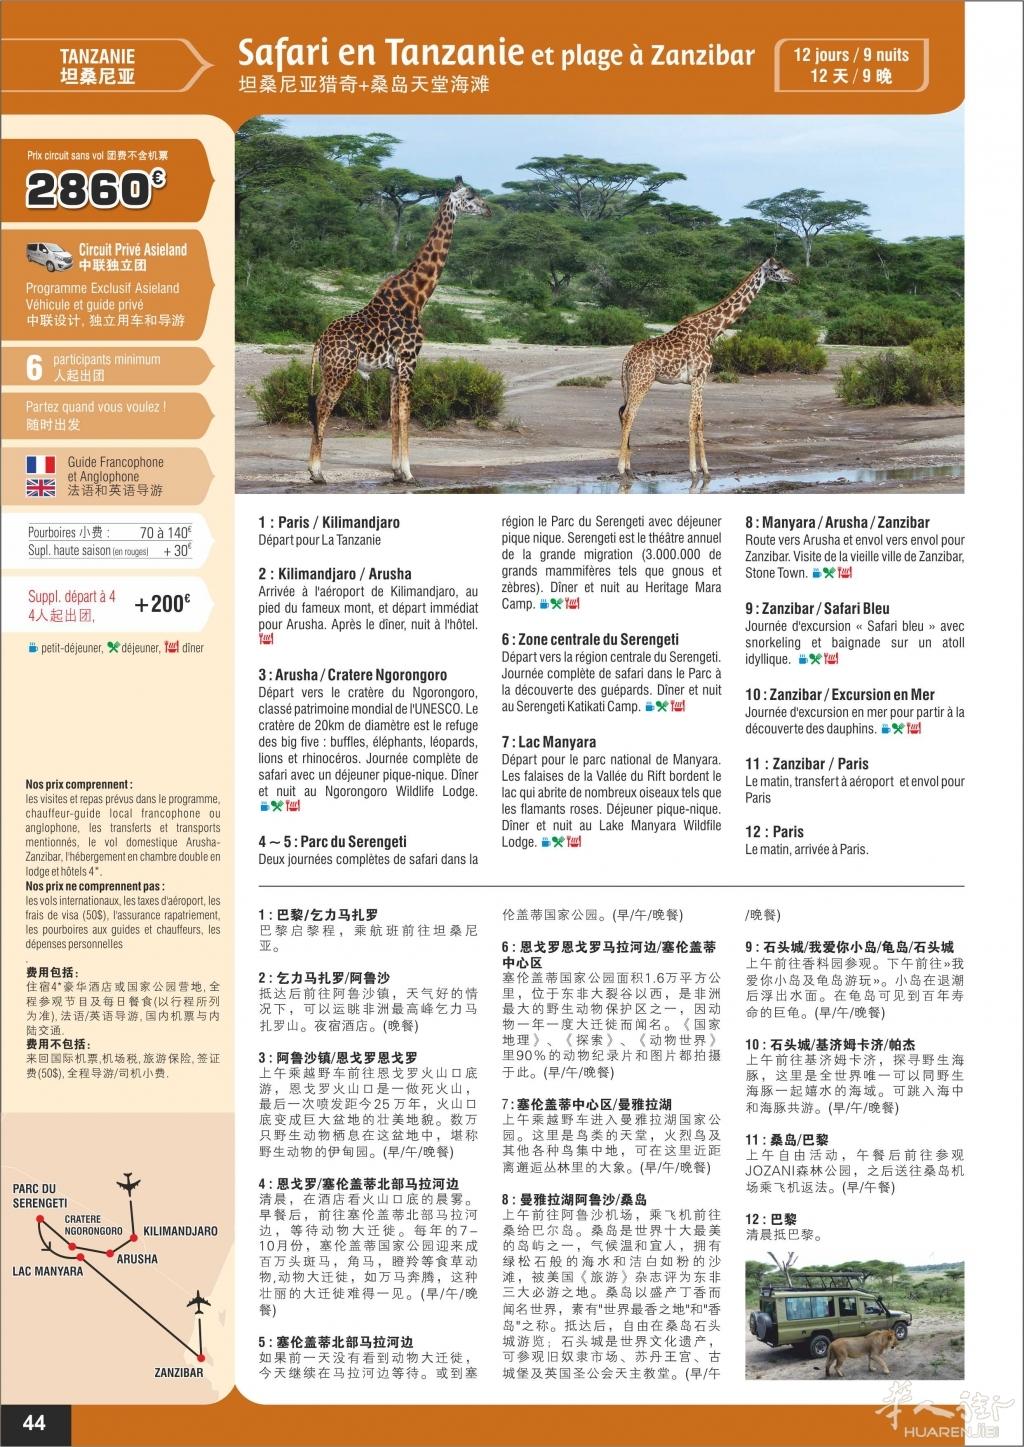 p44-Safari en Tanzanie-12j-v06.jpg